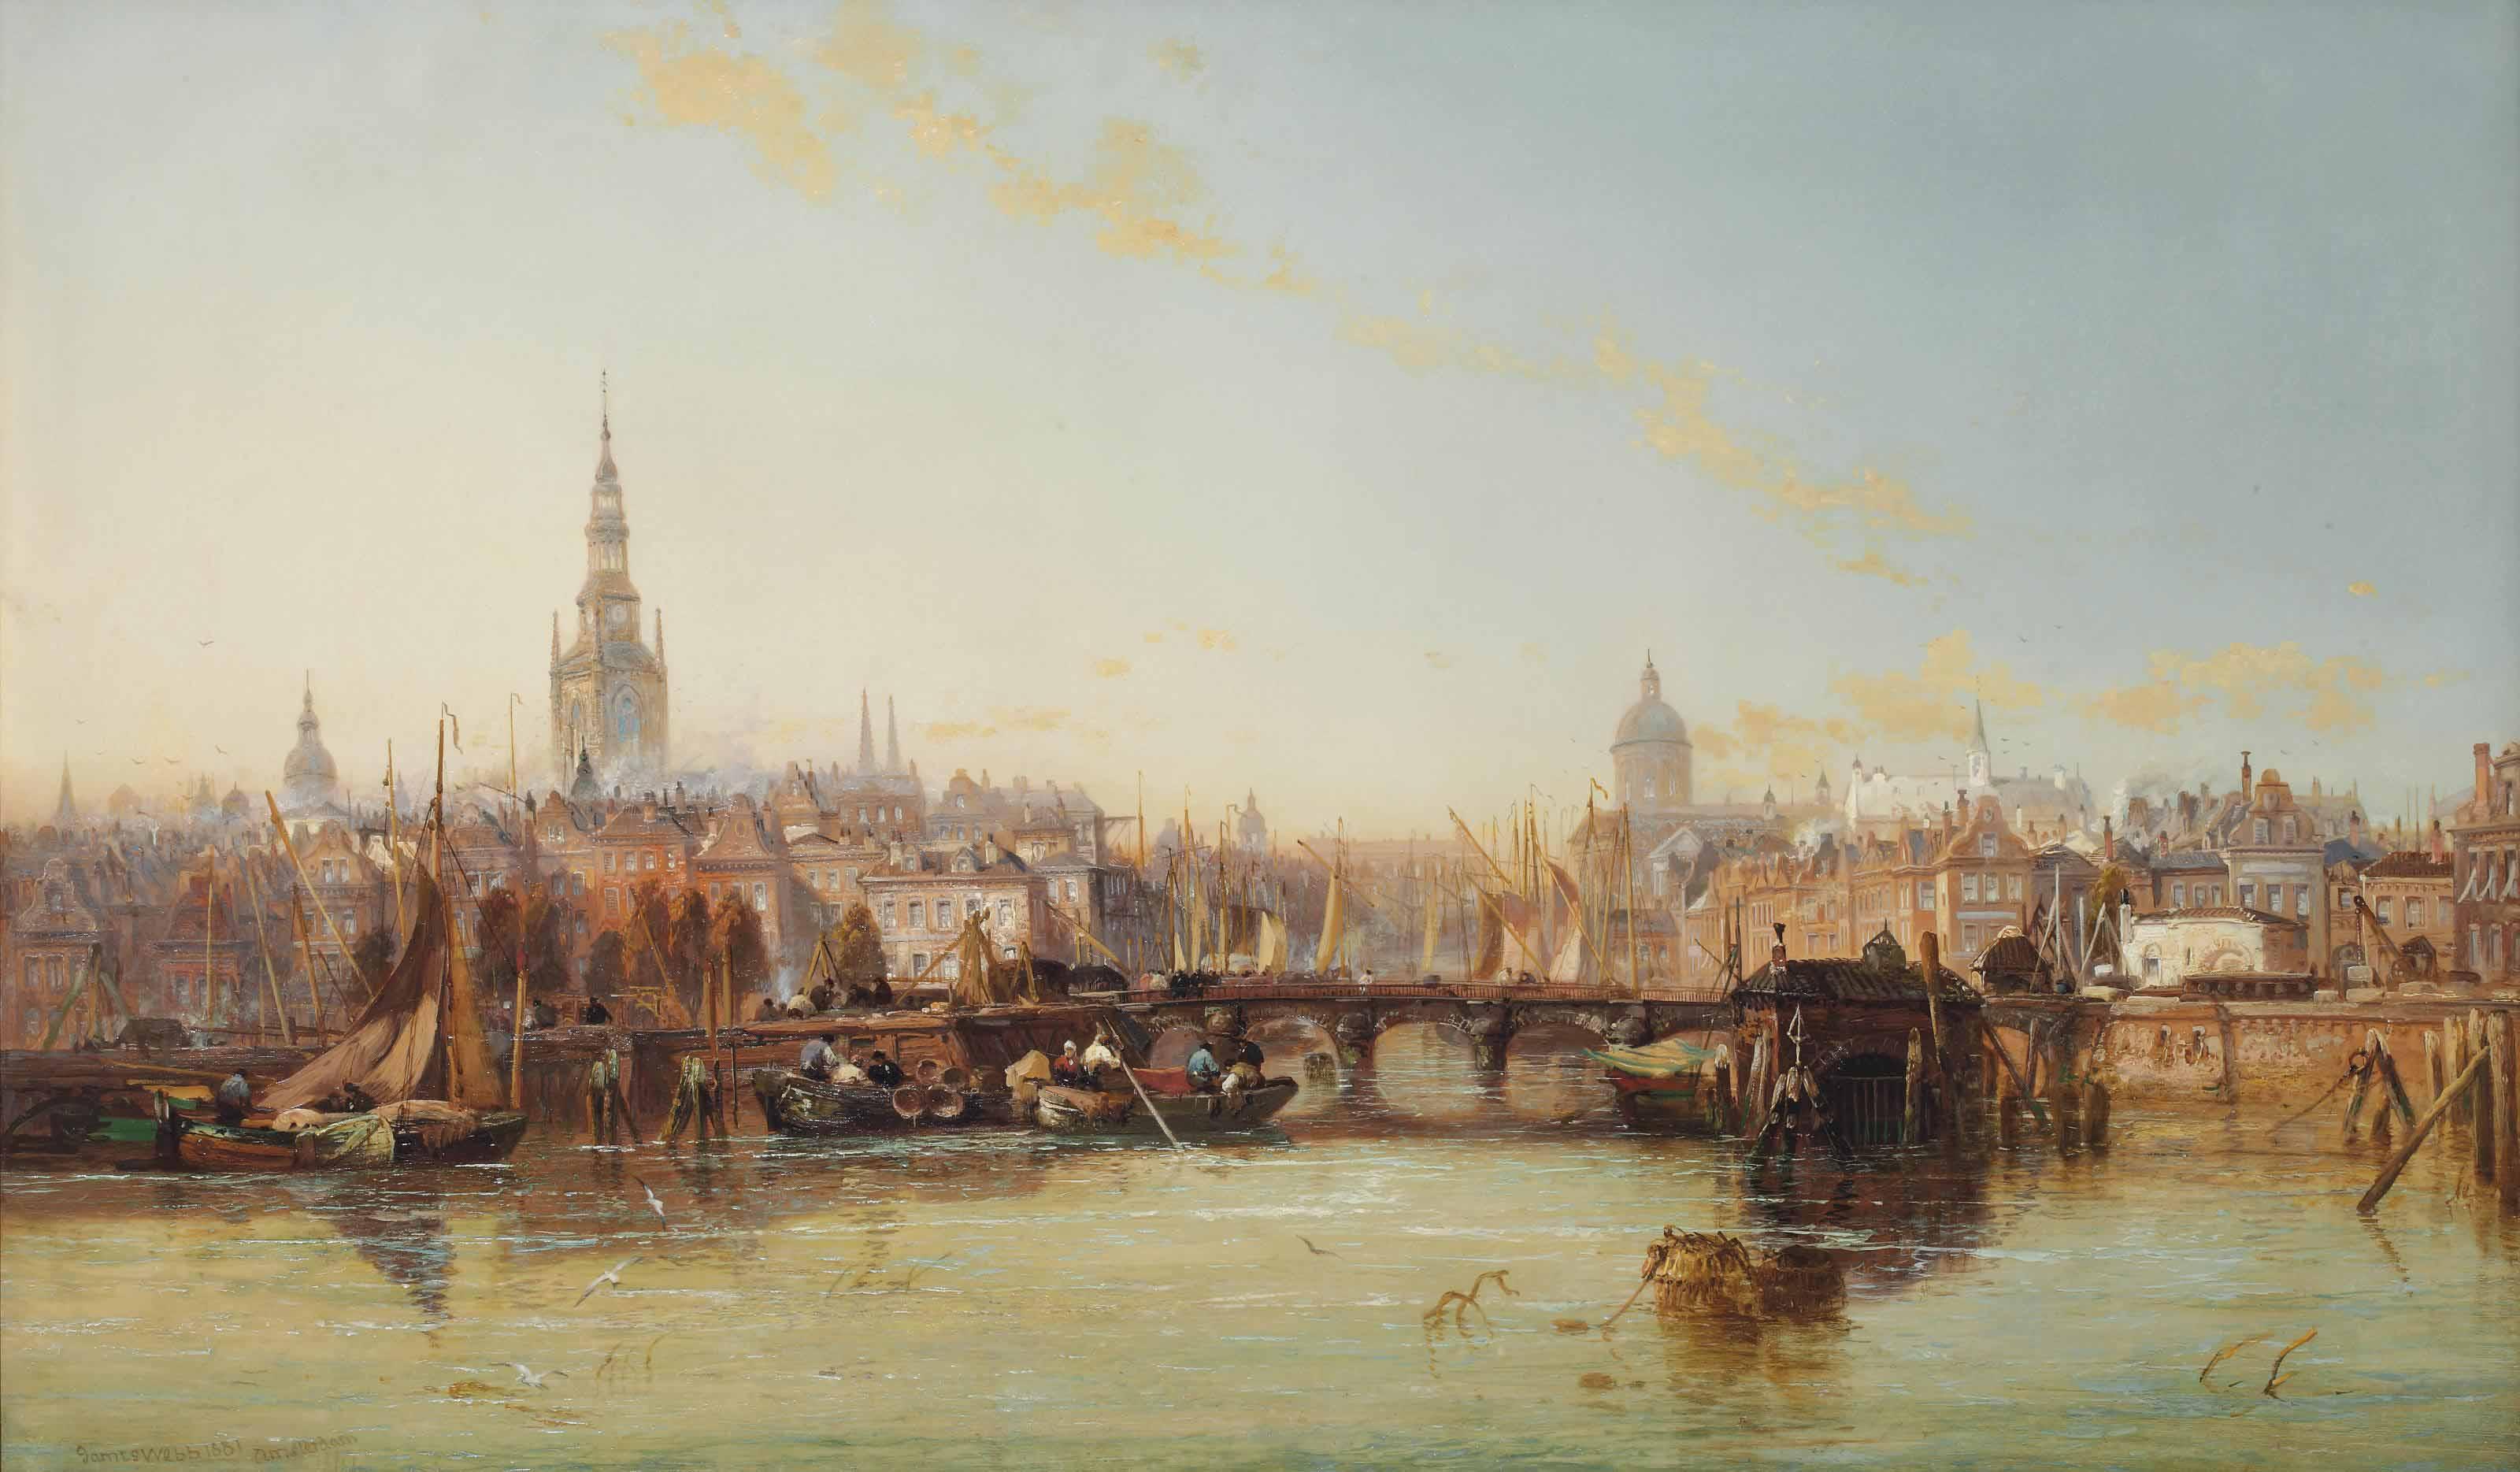 James Webb (Chelsea 1825-1895